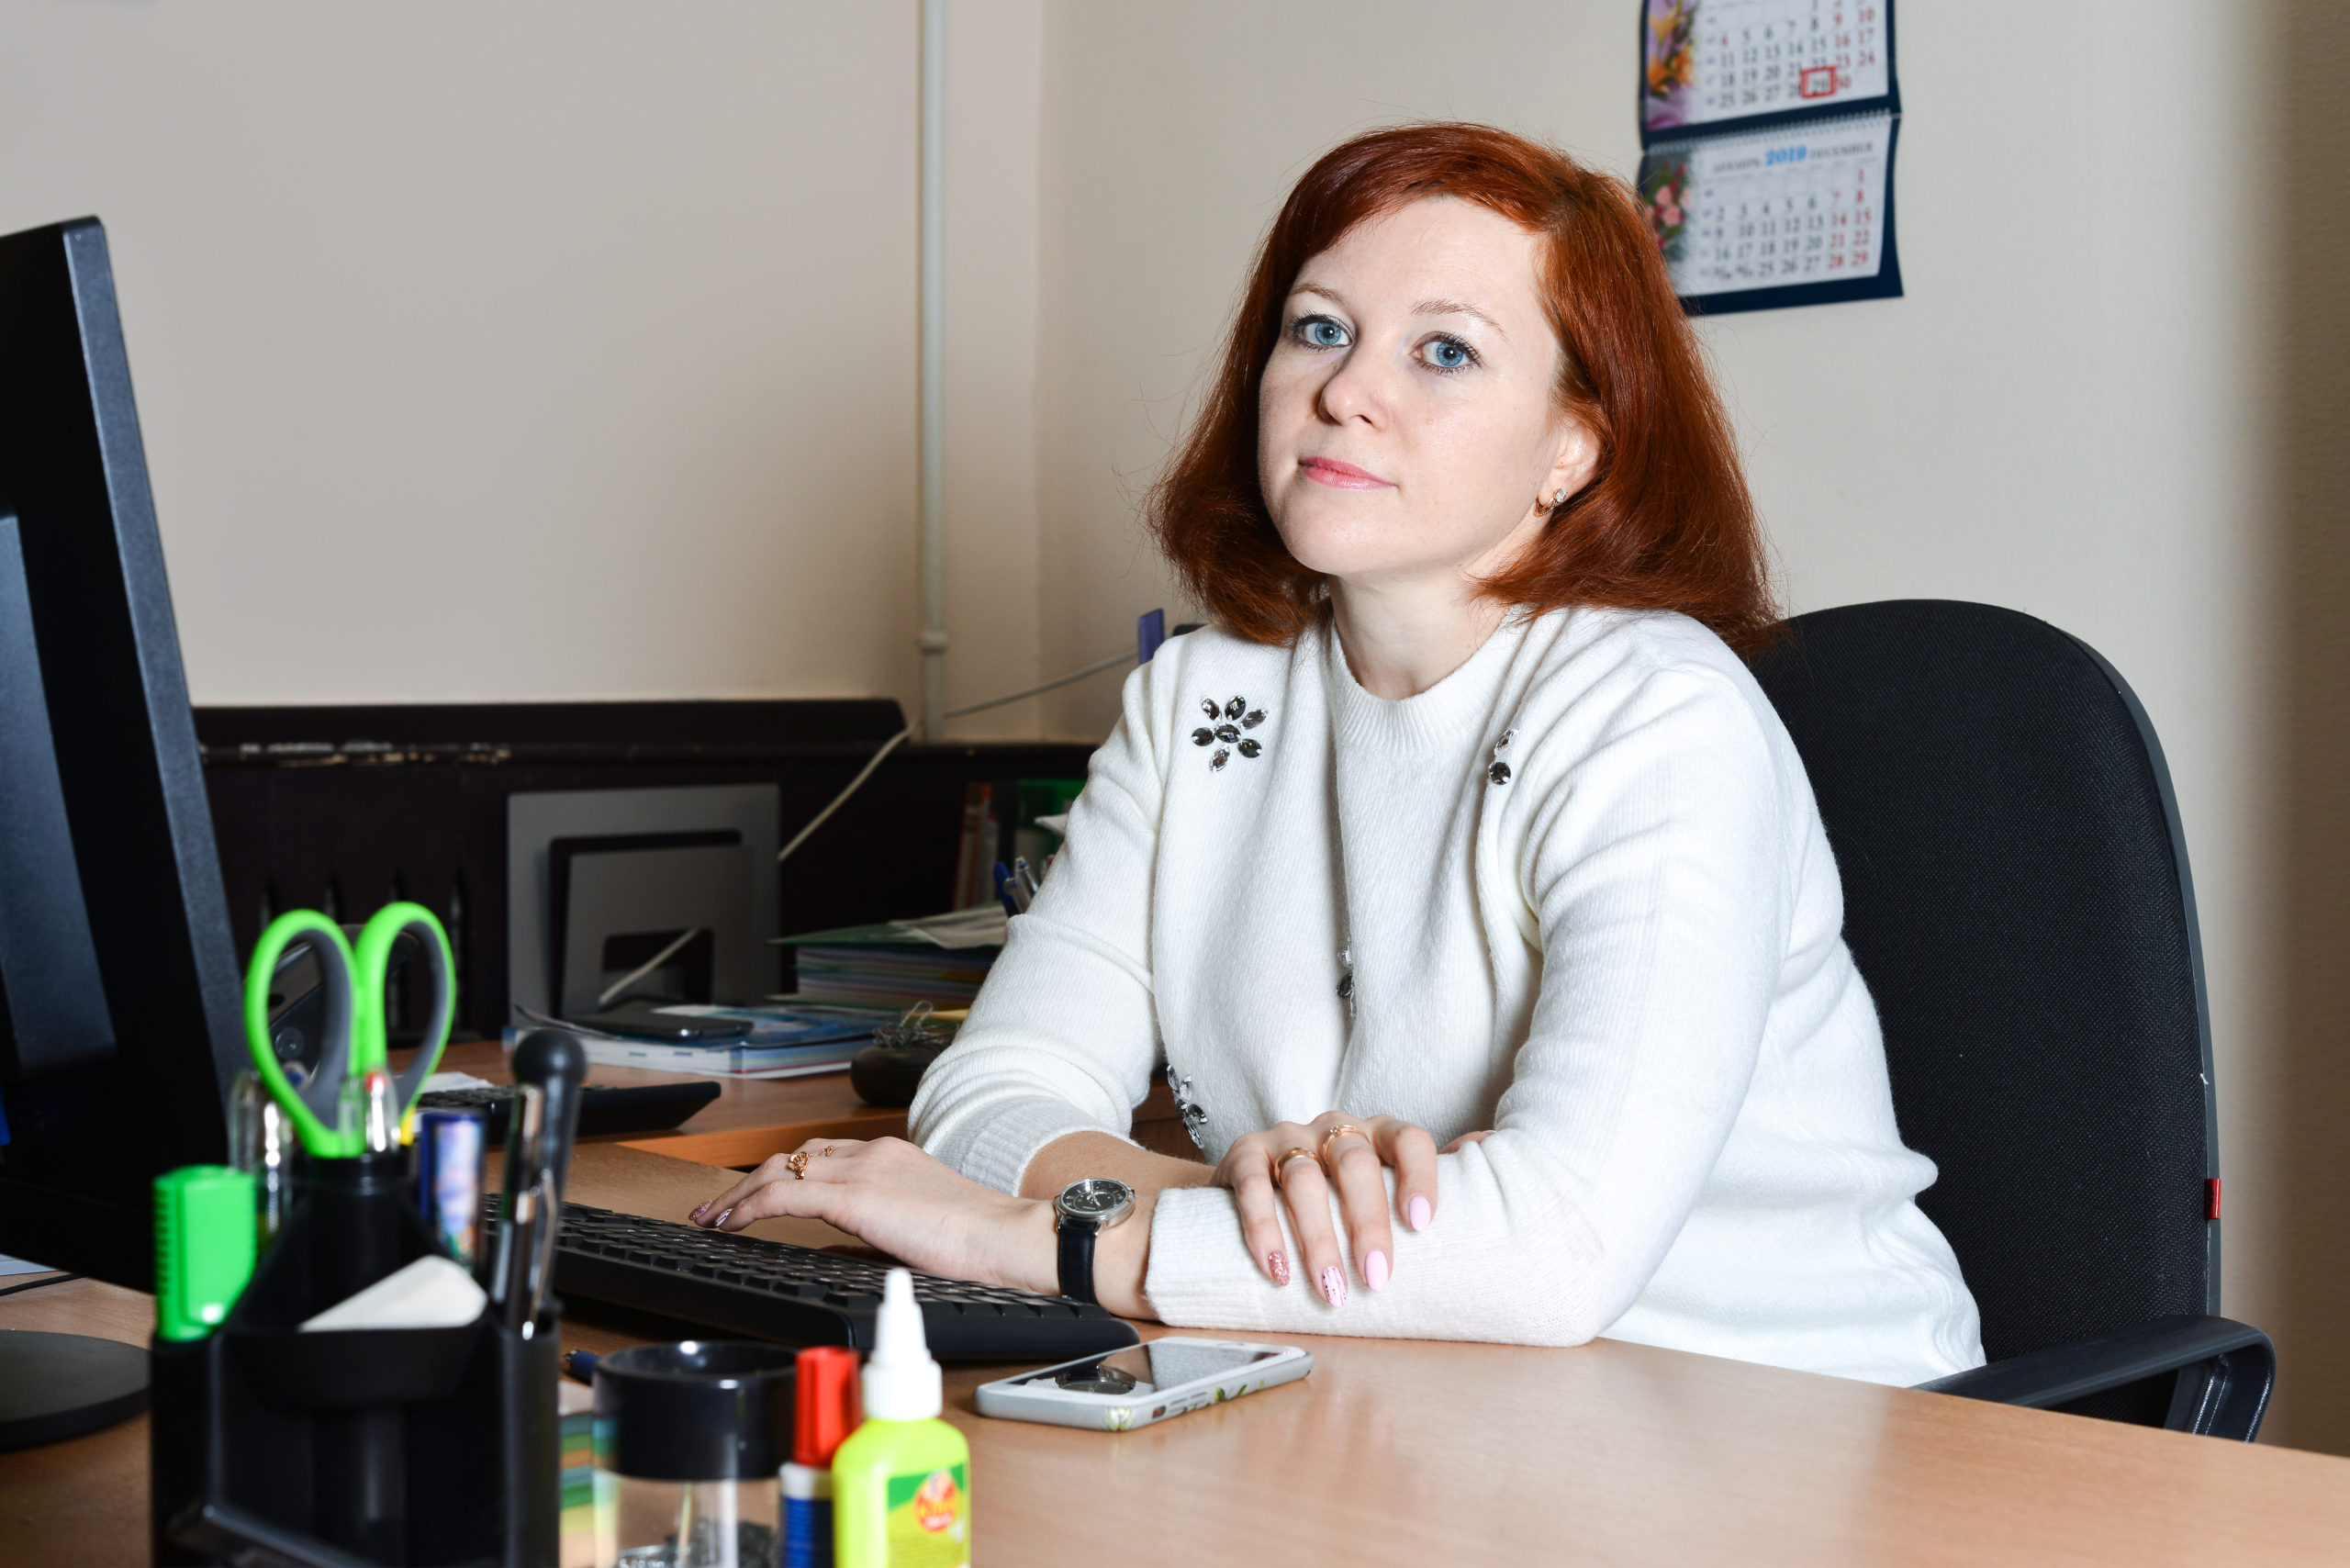 Шанских Евгения Валерьевна (Специалист по кадрам)